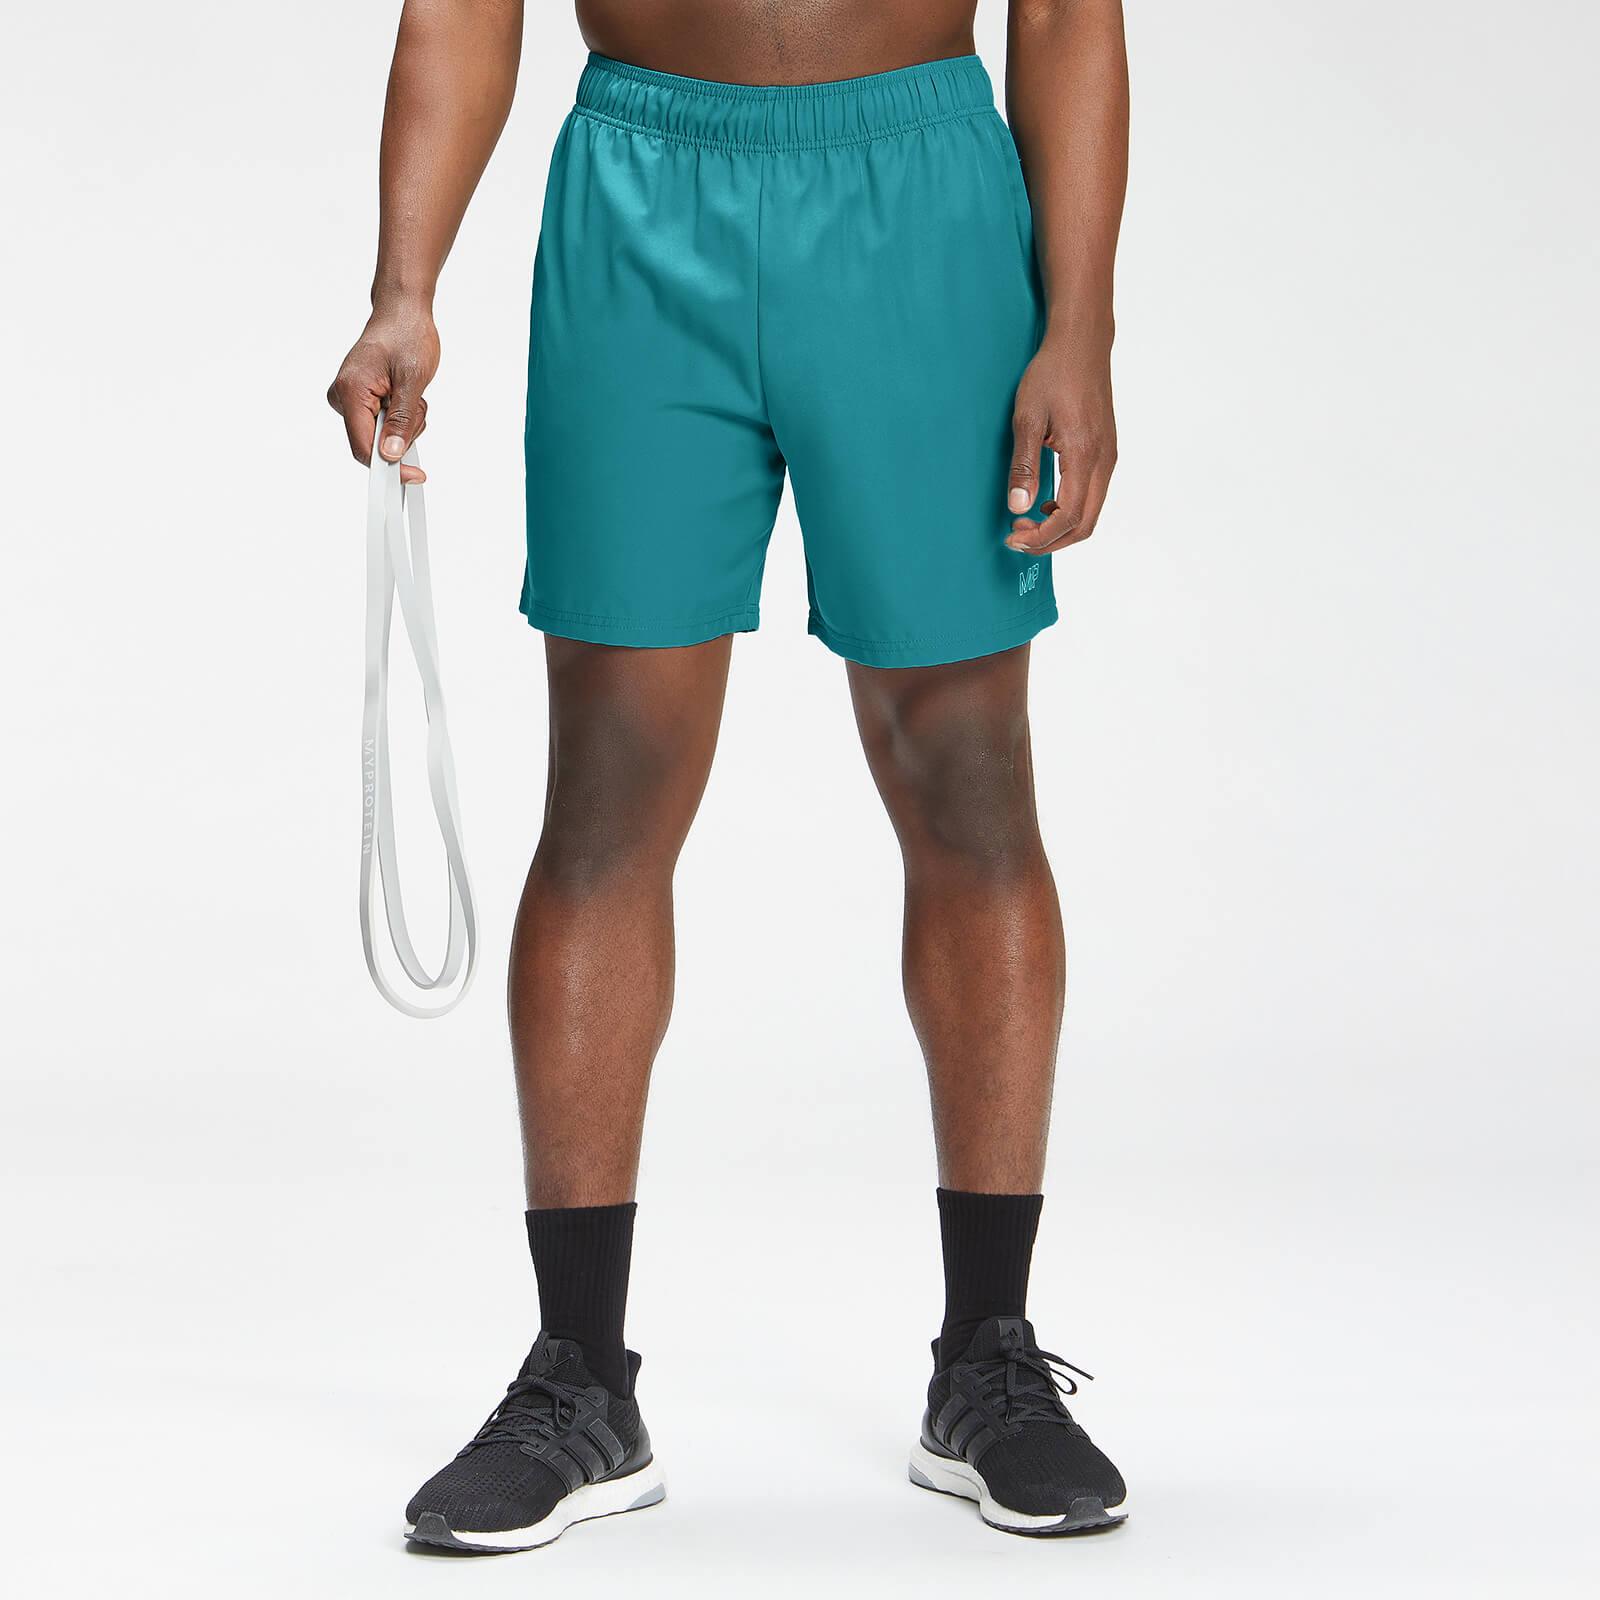 Купить MP Men's Repeat Mark Graphic Training Shorts - Teal - XXS, Myprotein International